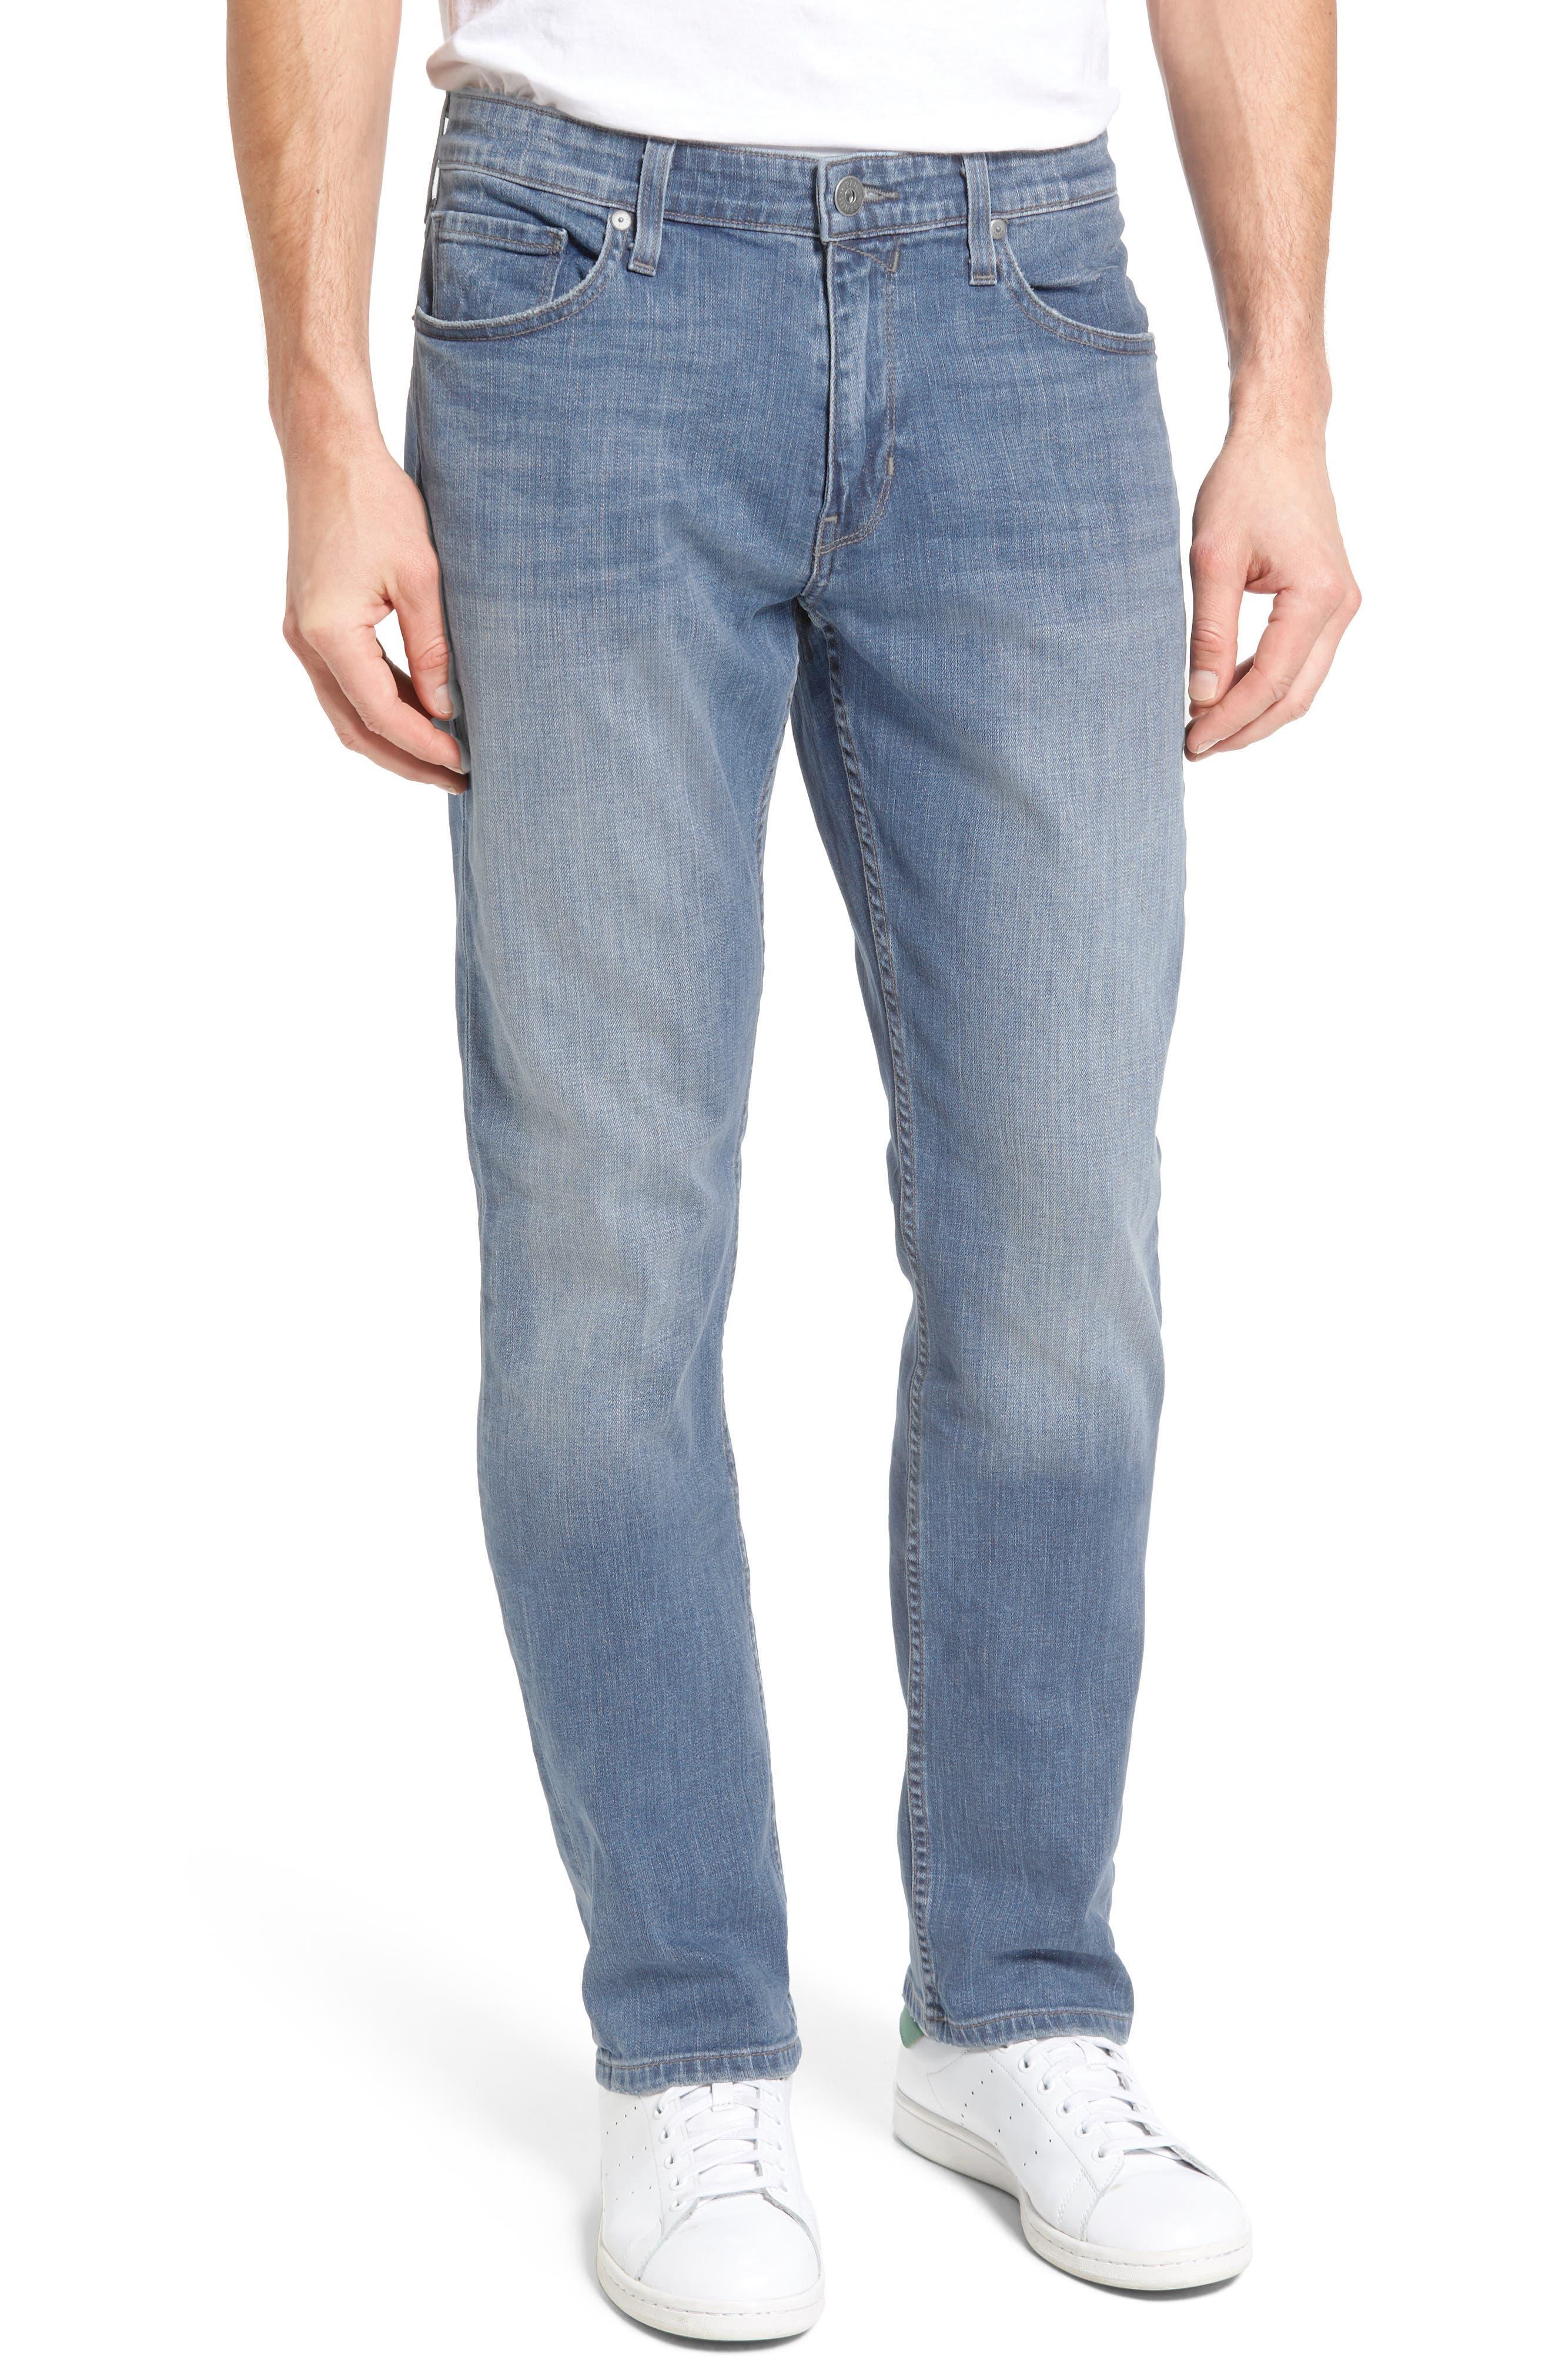 PAIGE Transcend - Federal Slim Straight Leg Jeans (Dome)